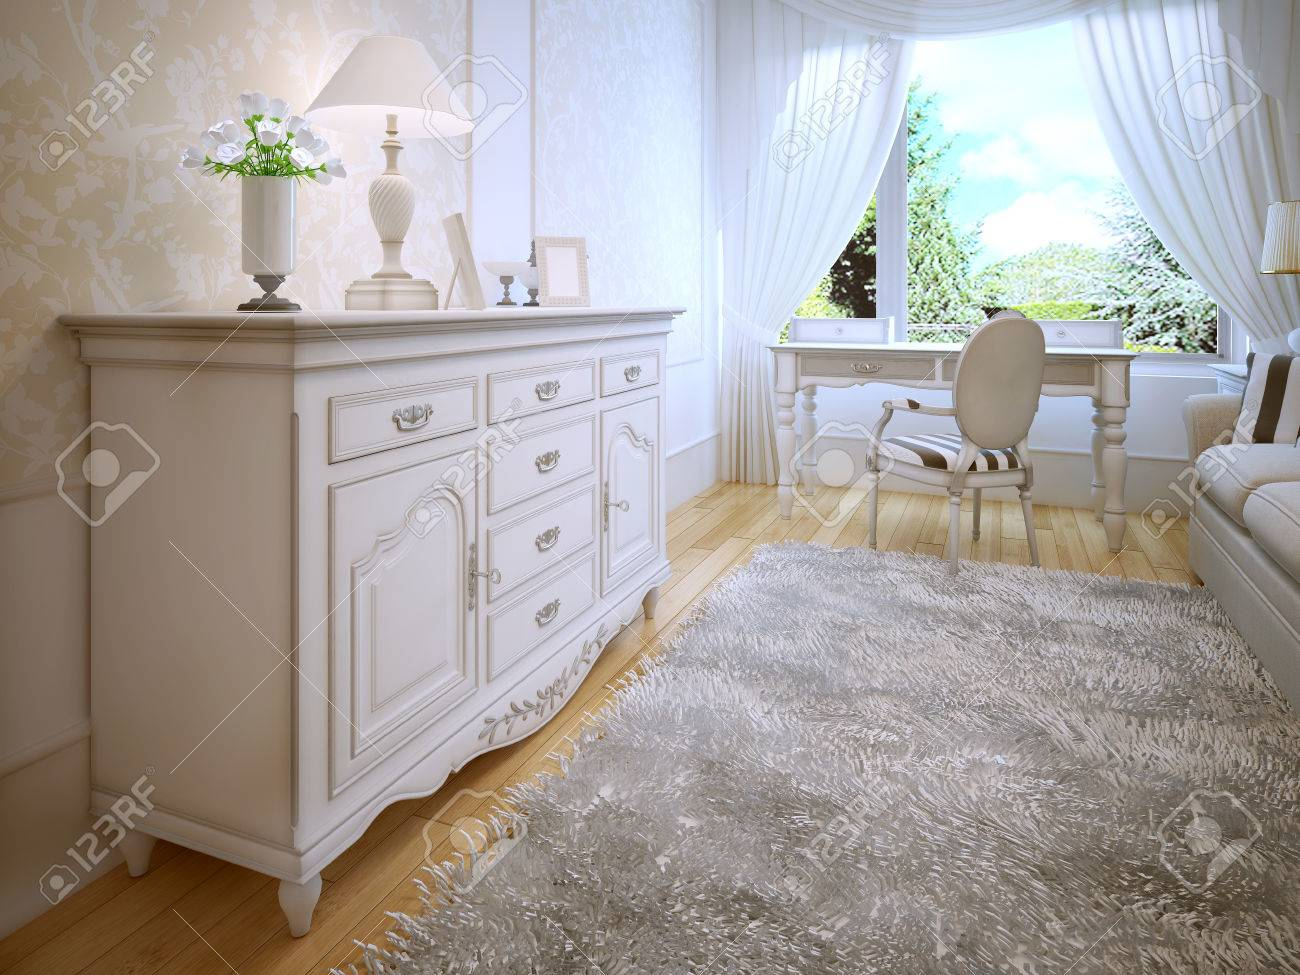 White Dresser In Classic Bedroom Parquet Light Wood Floors Gray Wool Carpet